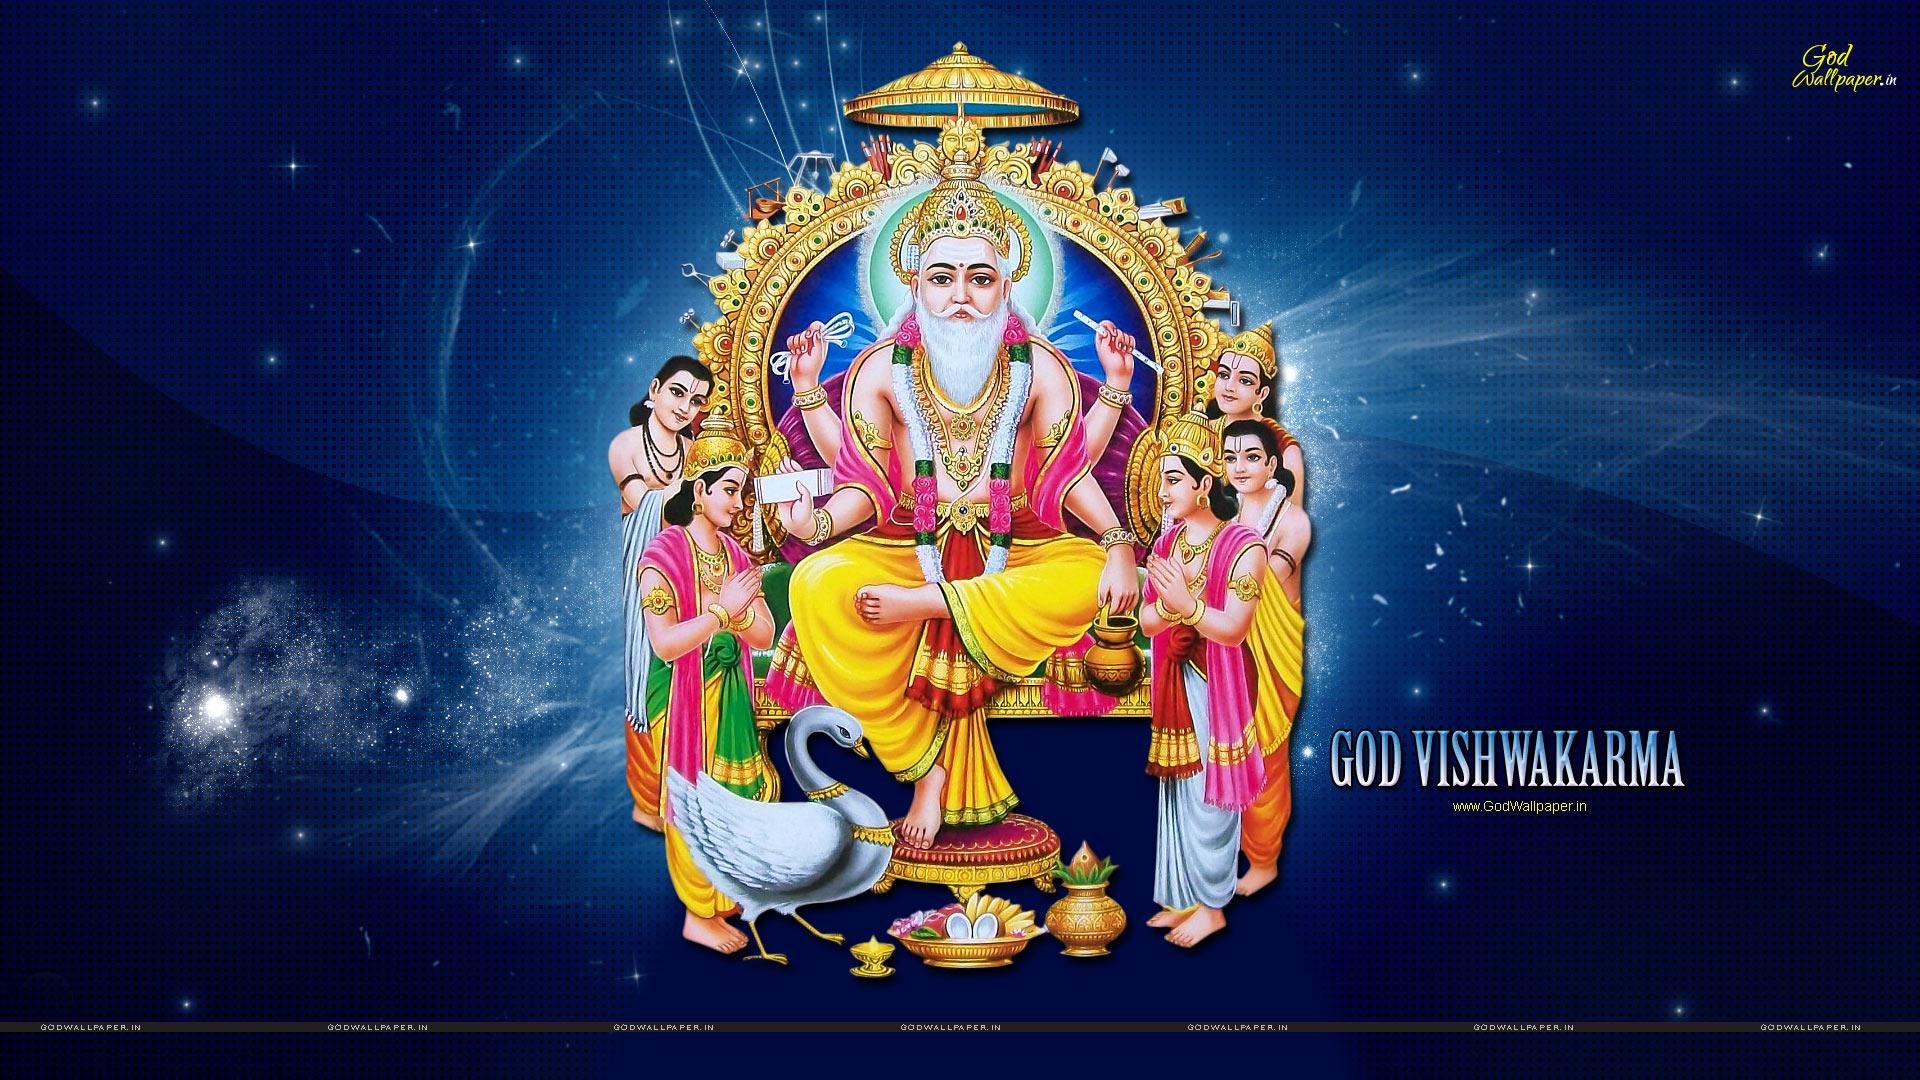 Lord vishwakarma photo gallery Narayaneeyam - Achyuthan